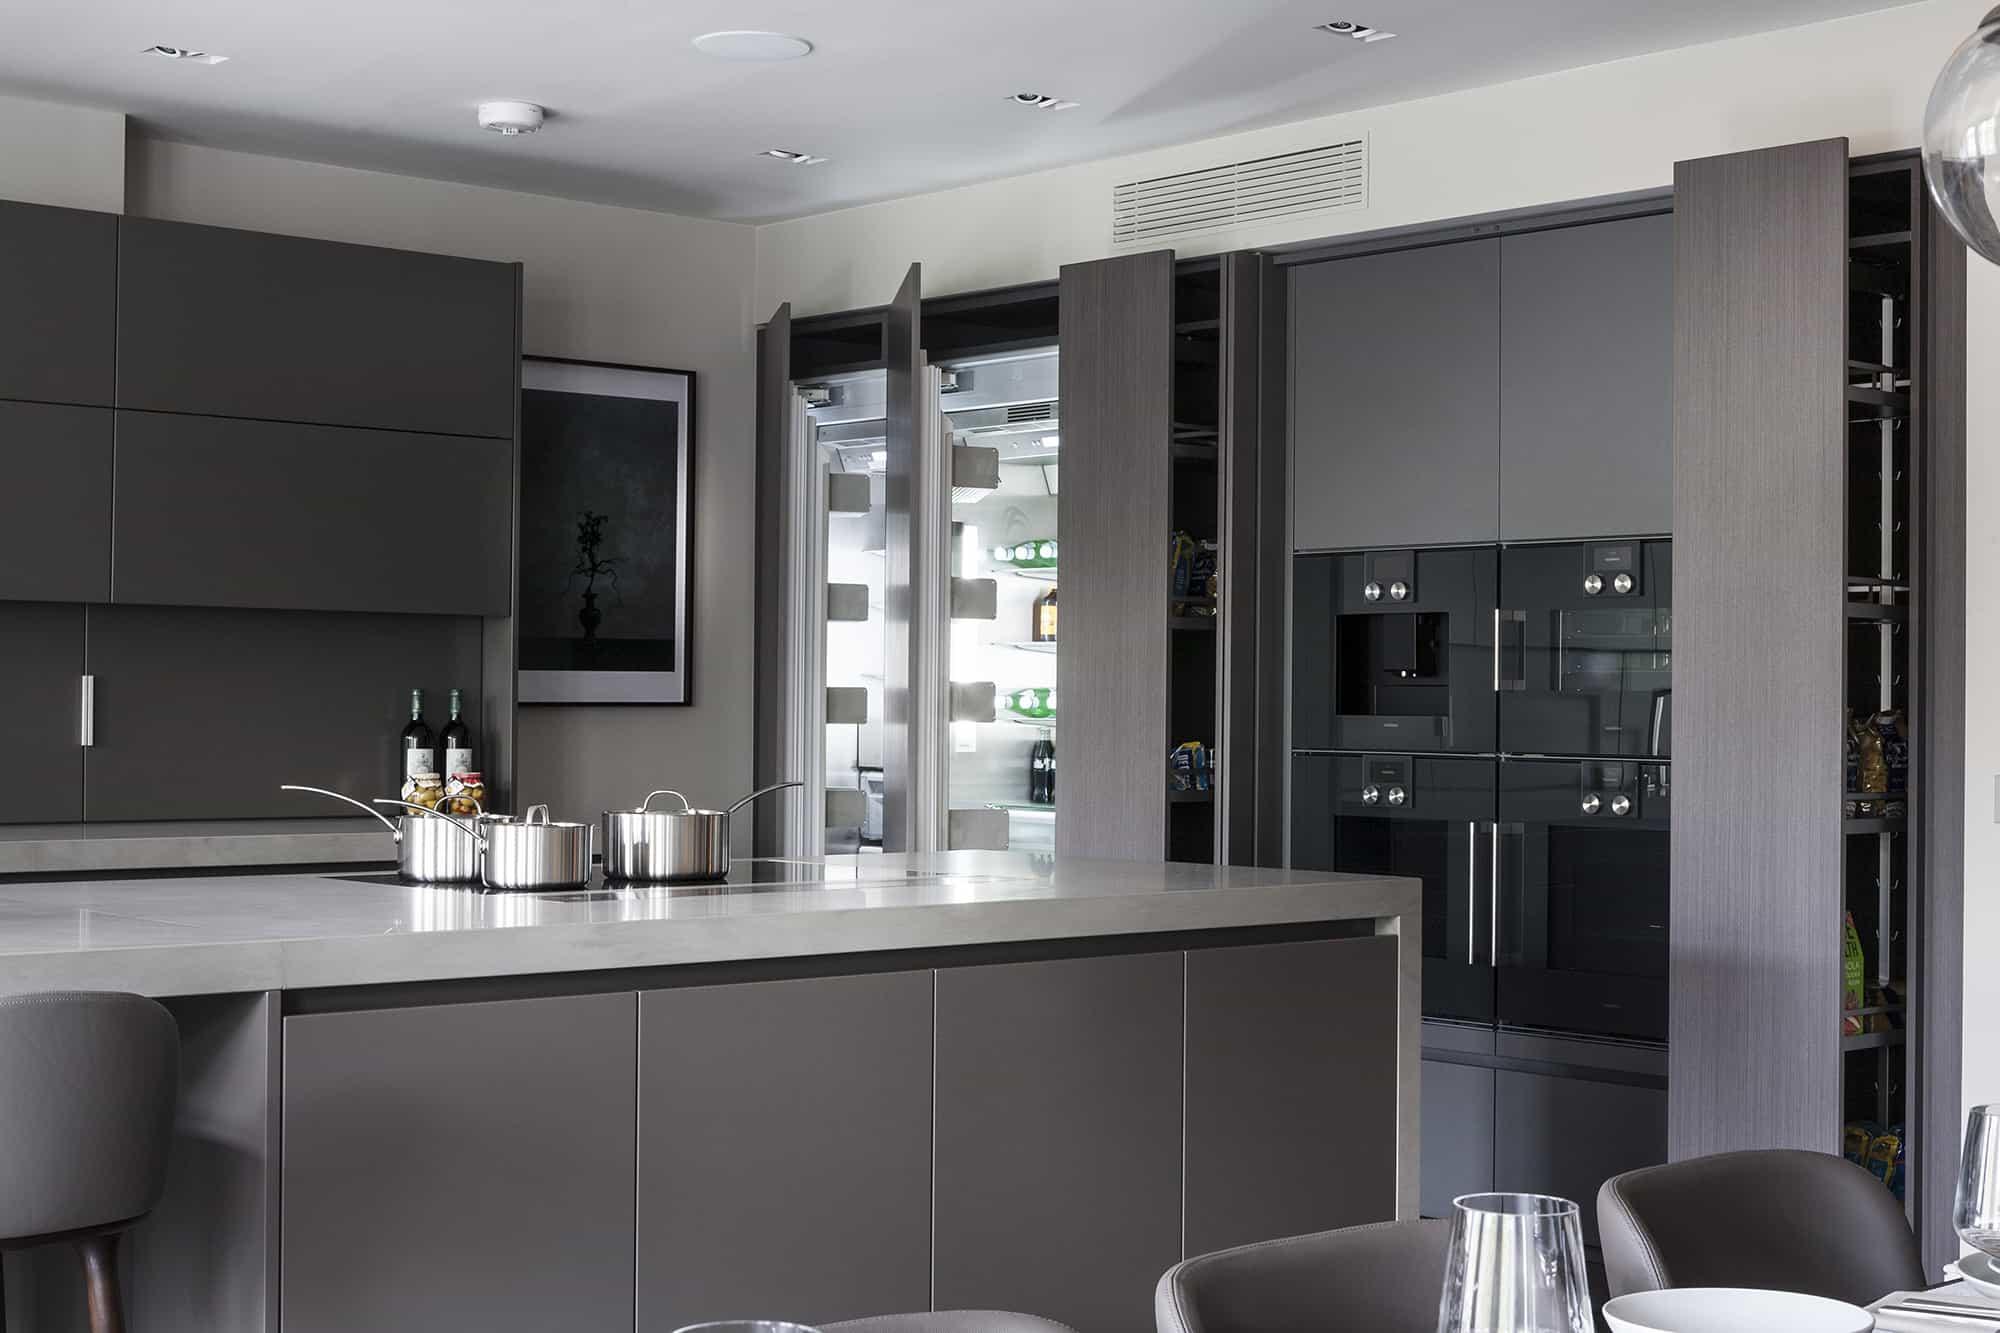 open integrated appliances in a luxury modern kitchen